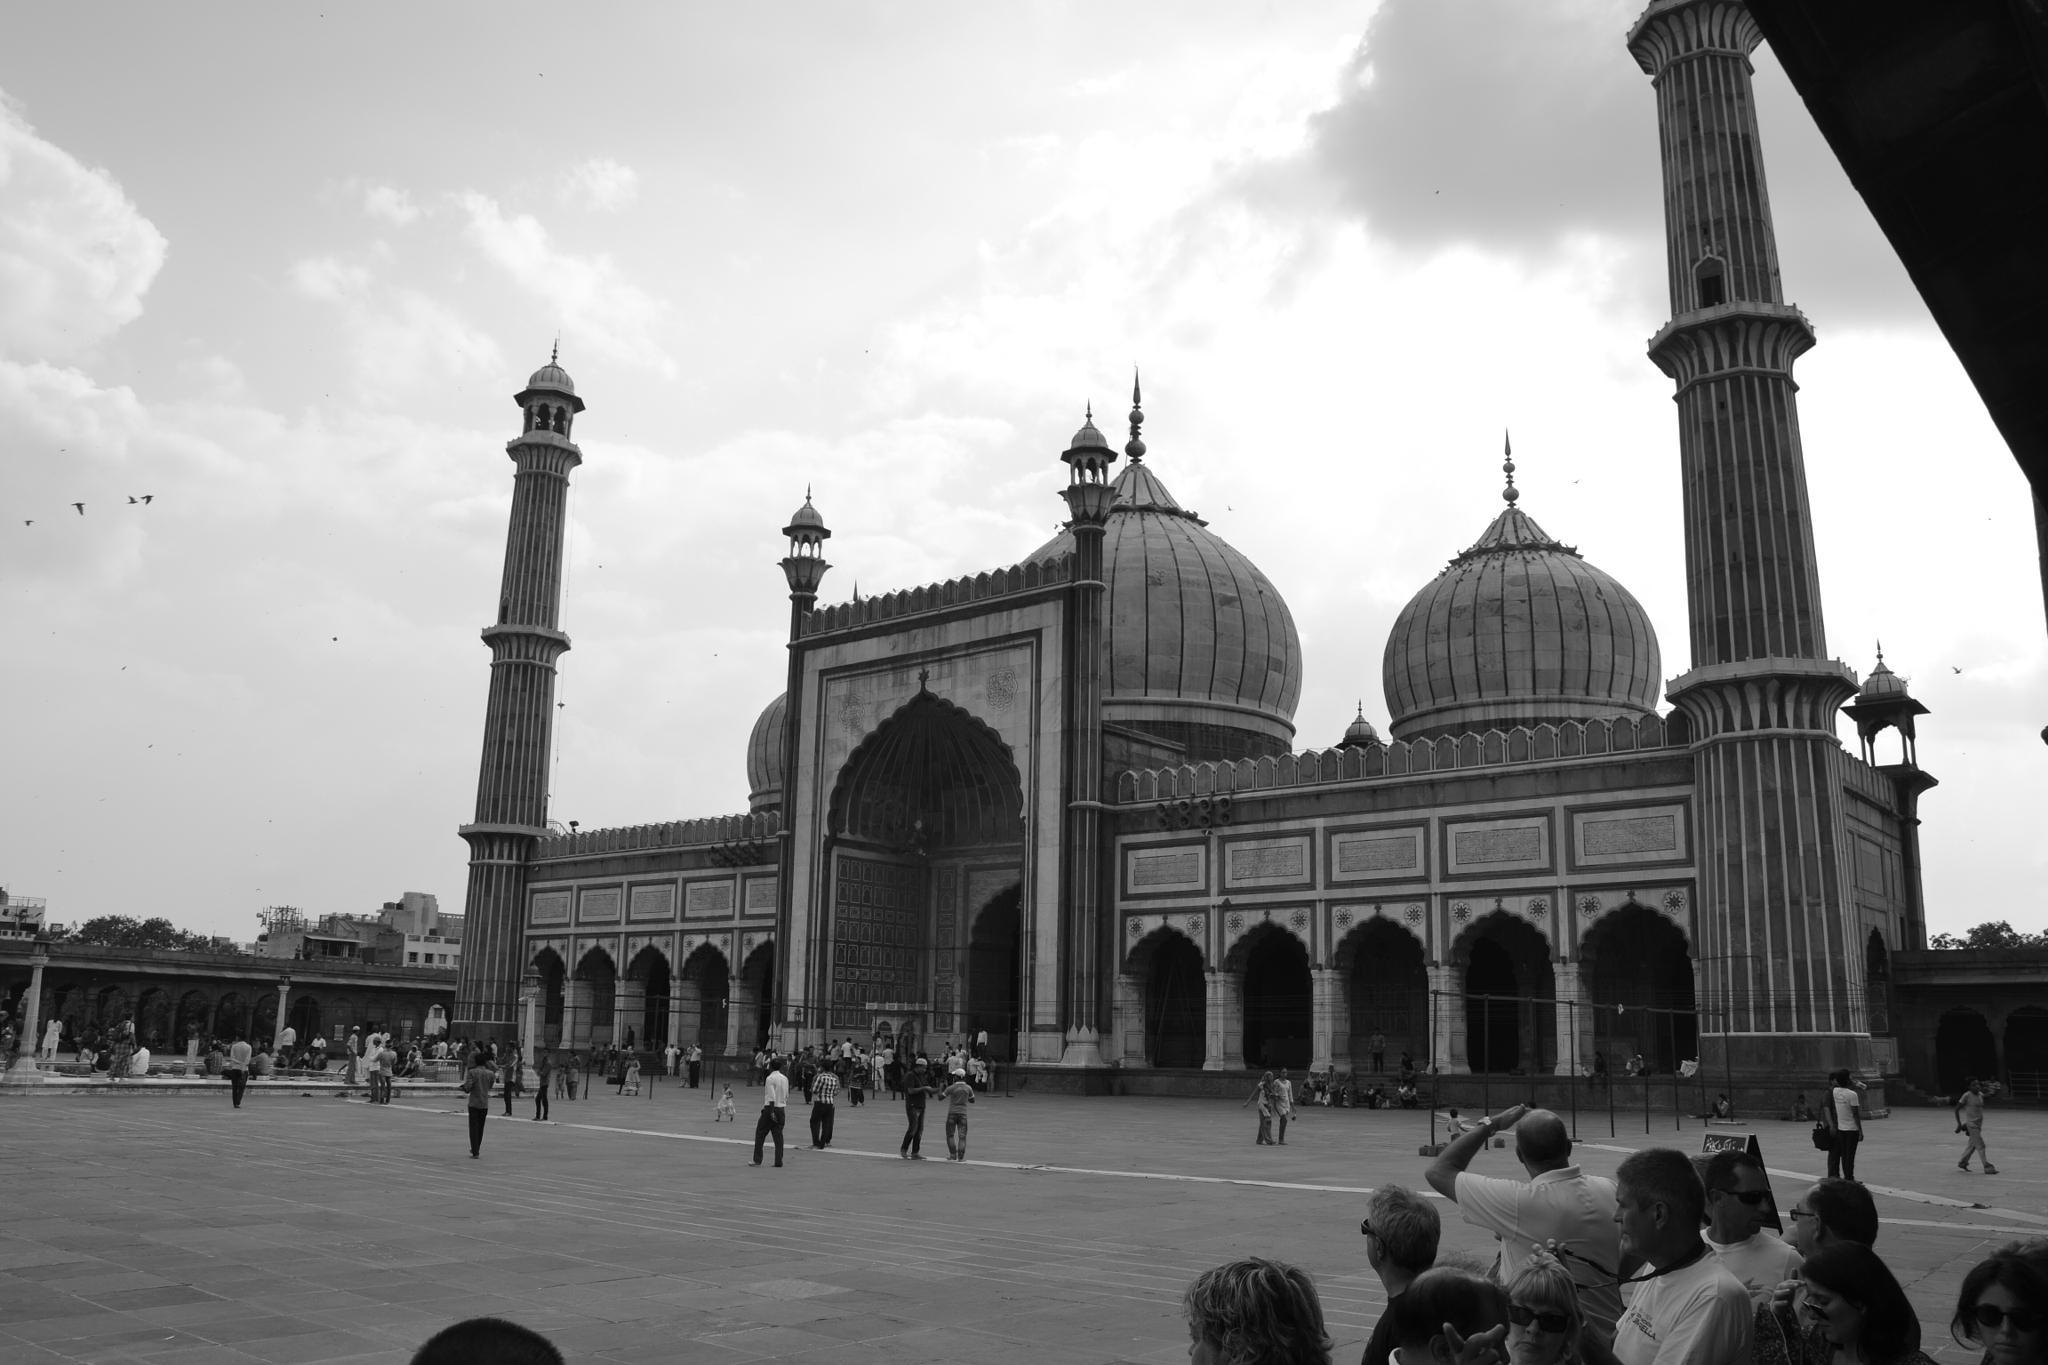 Mezquita de Dheli by xemariagil